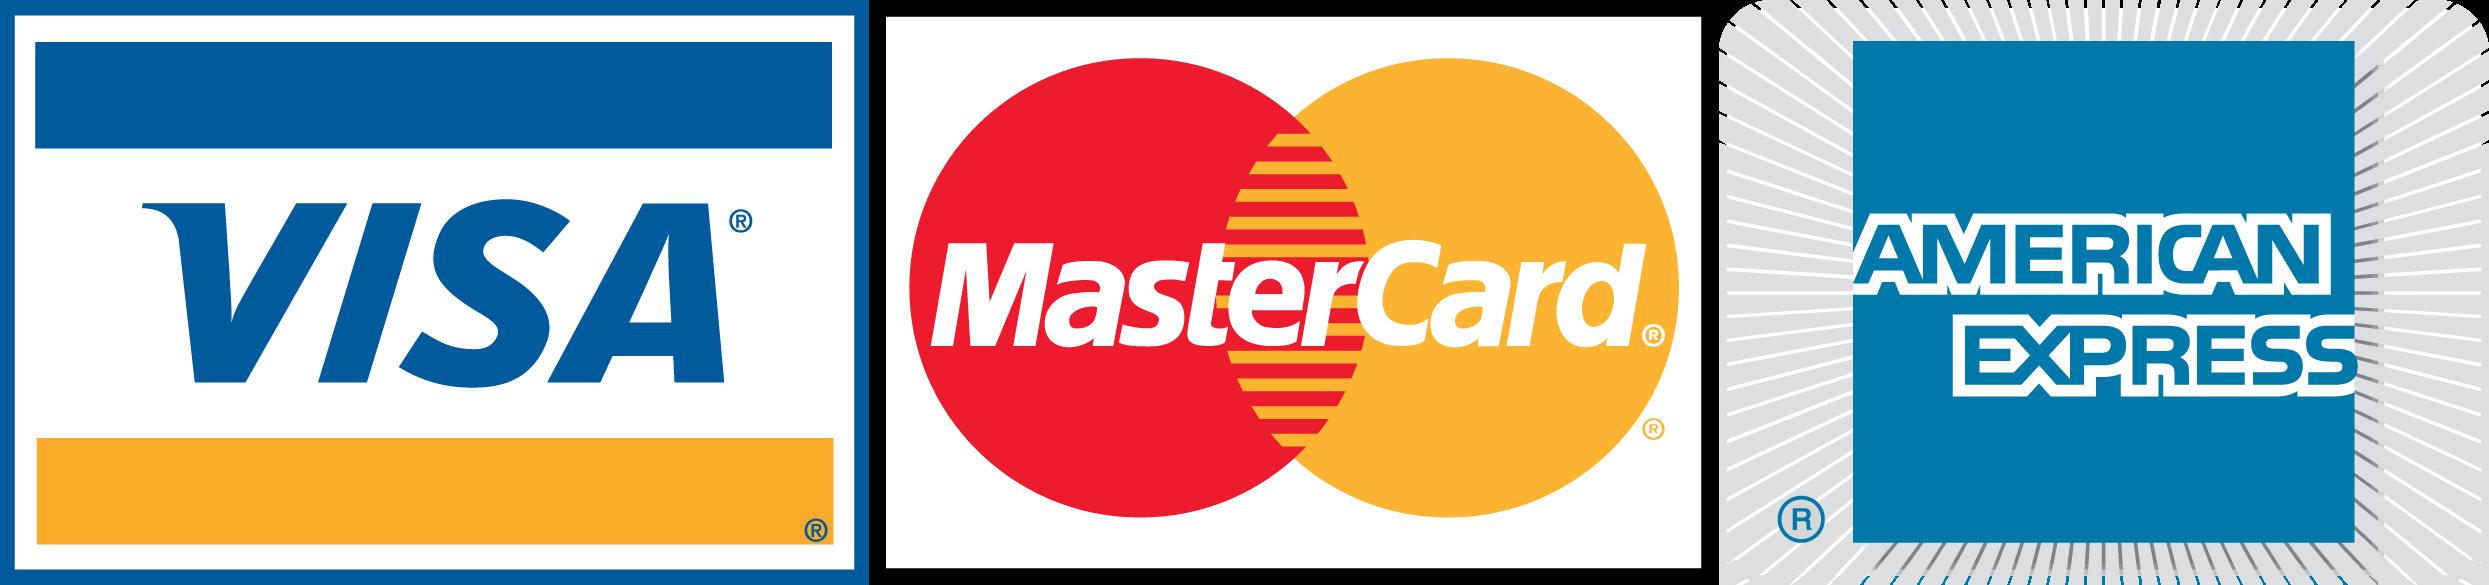 Credit Card Visa And Master Card Transparent Background - Mastercard HD PNG